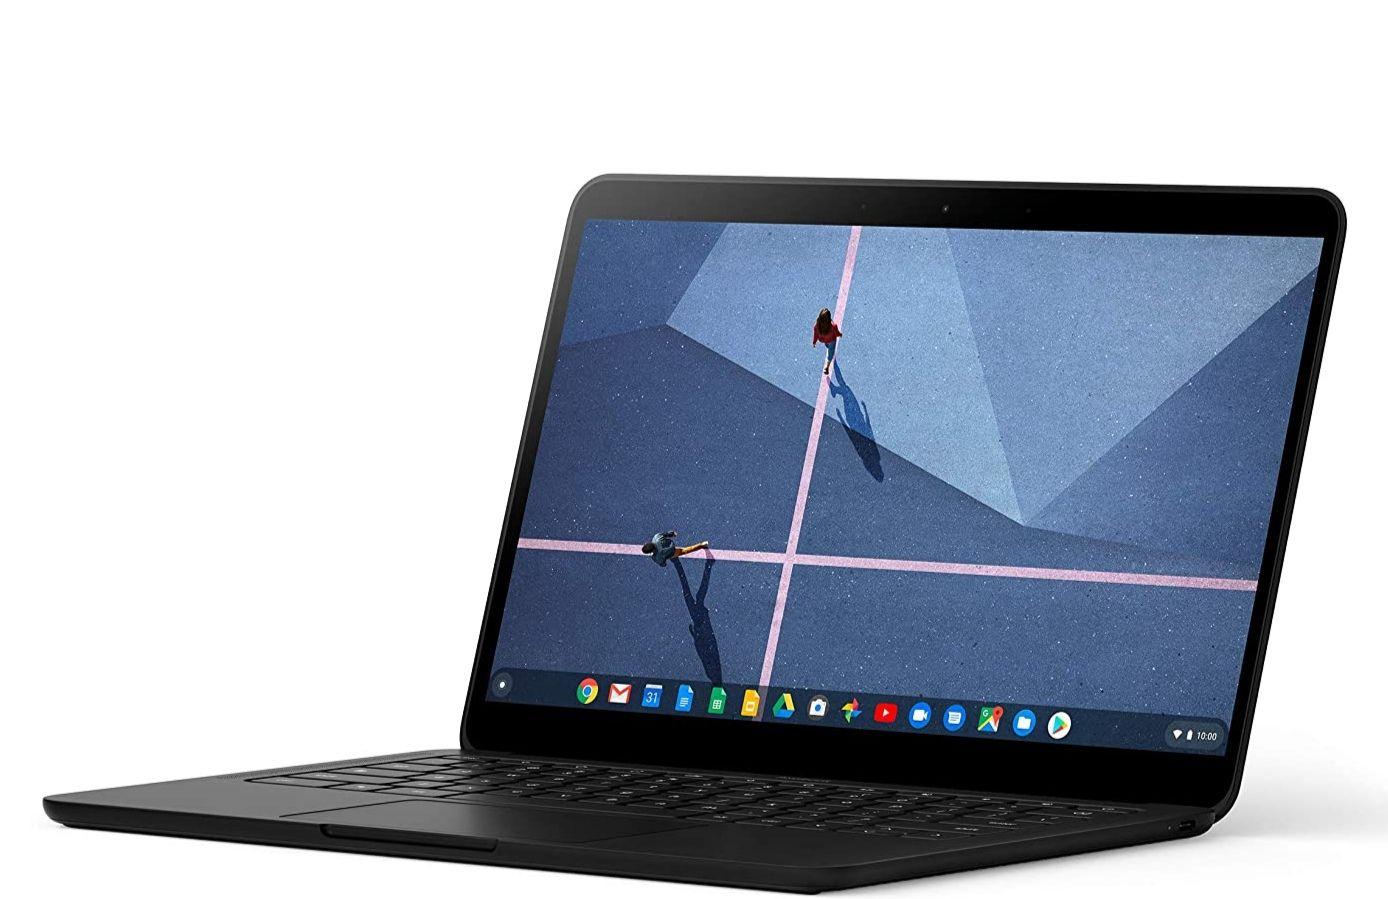 Google Pixelbook Go, Touchscreen, Intel M3, 8GB, 64GB, Just Black - £424.99 @ Stock Must Go / eBay